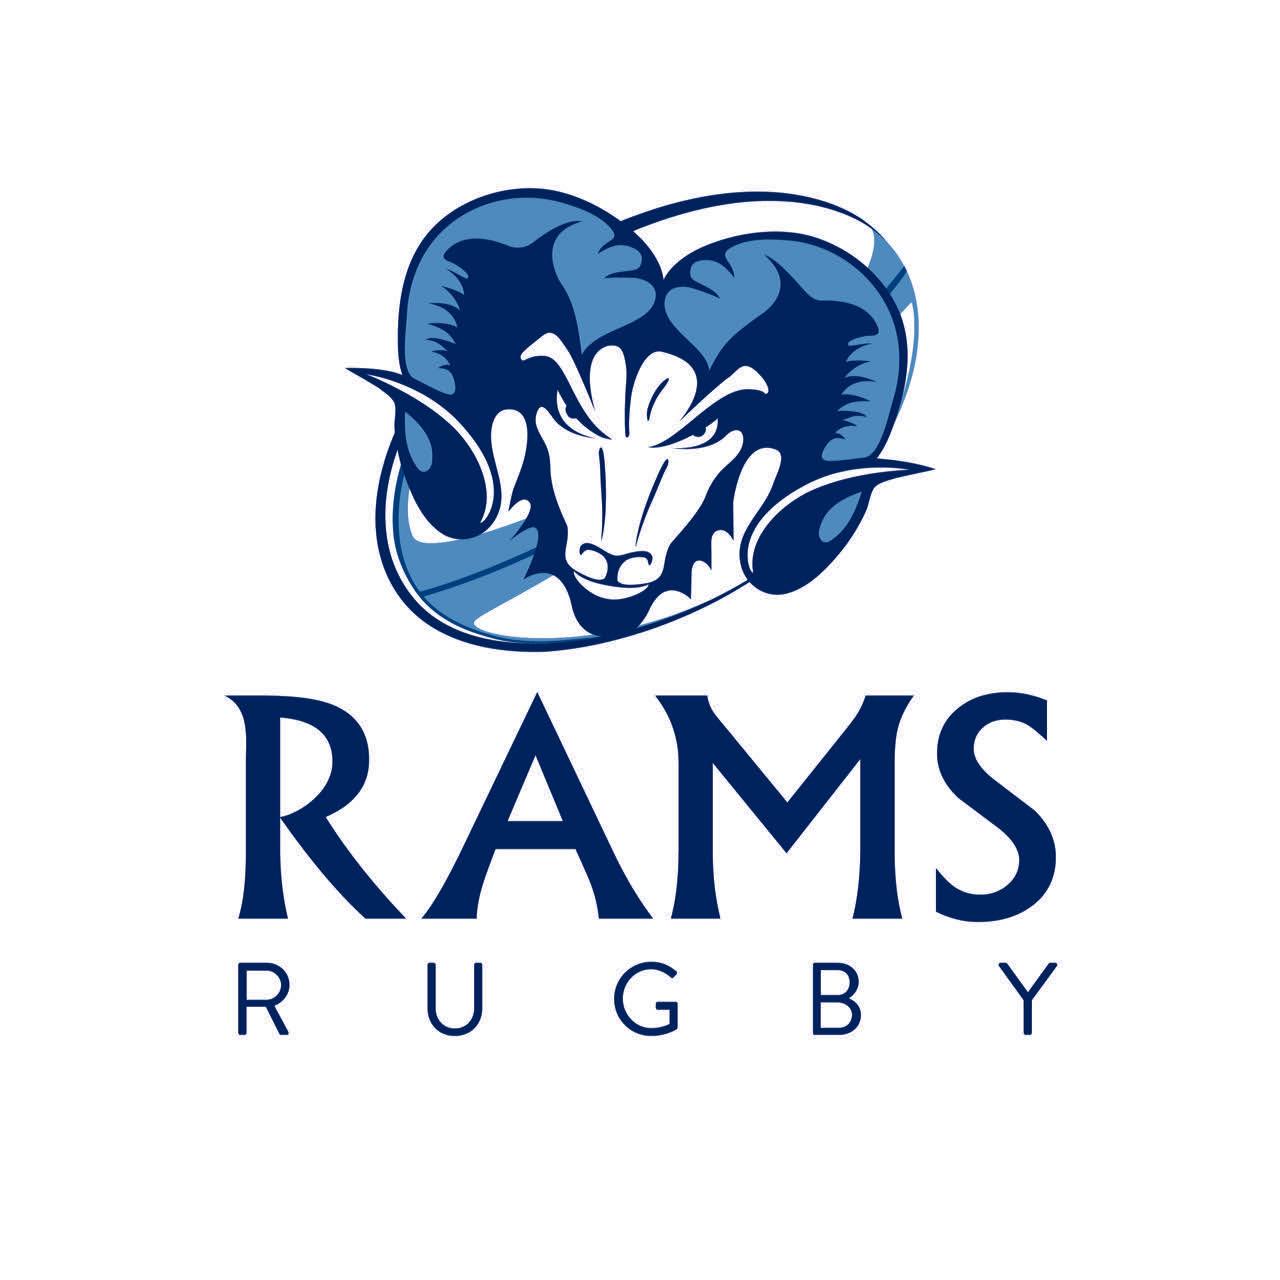 Rams R.F.C.